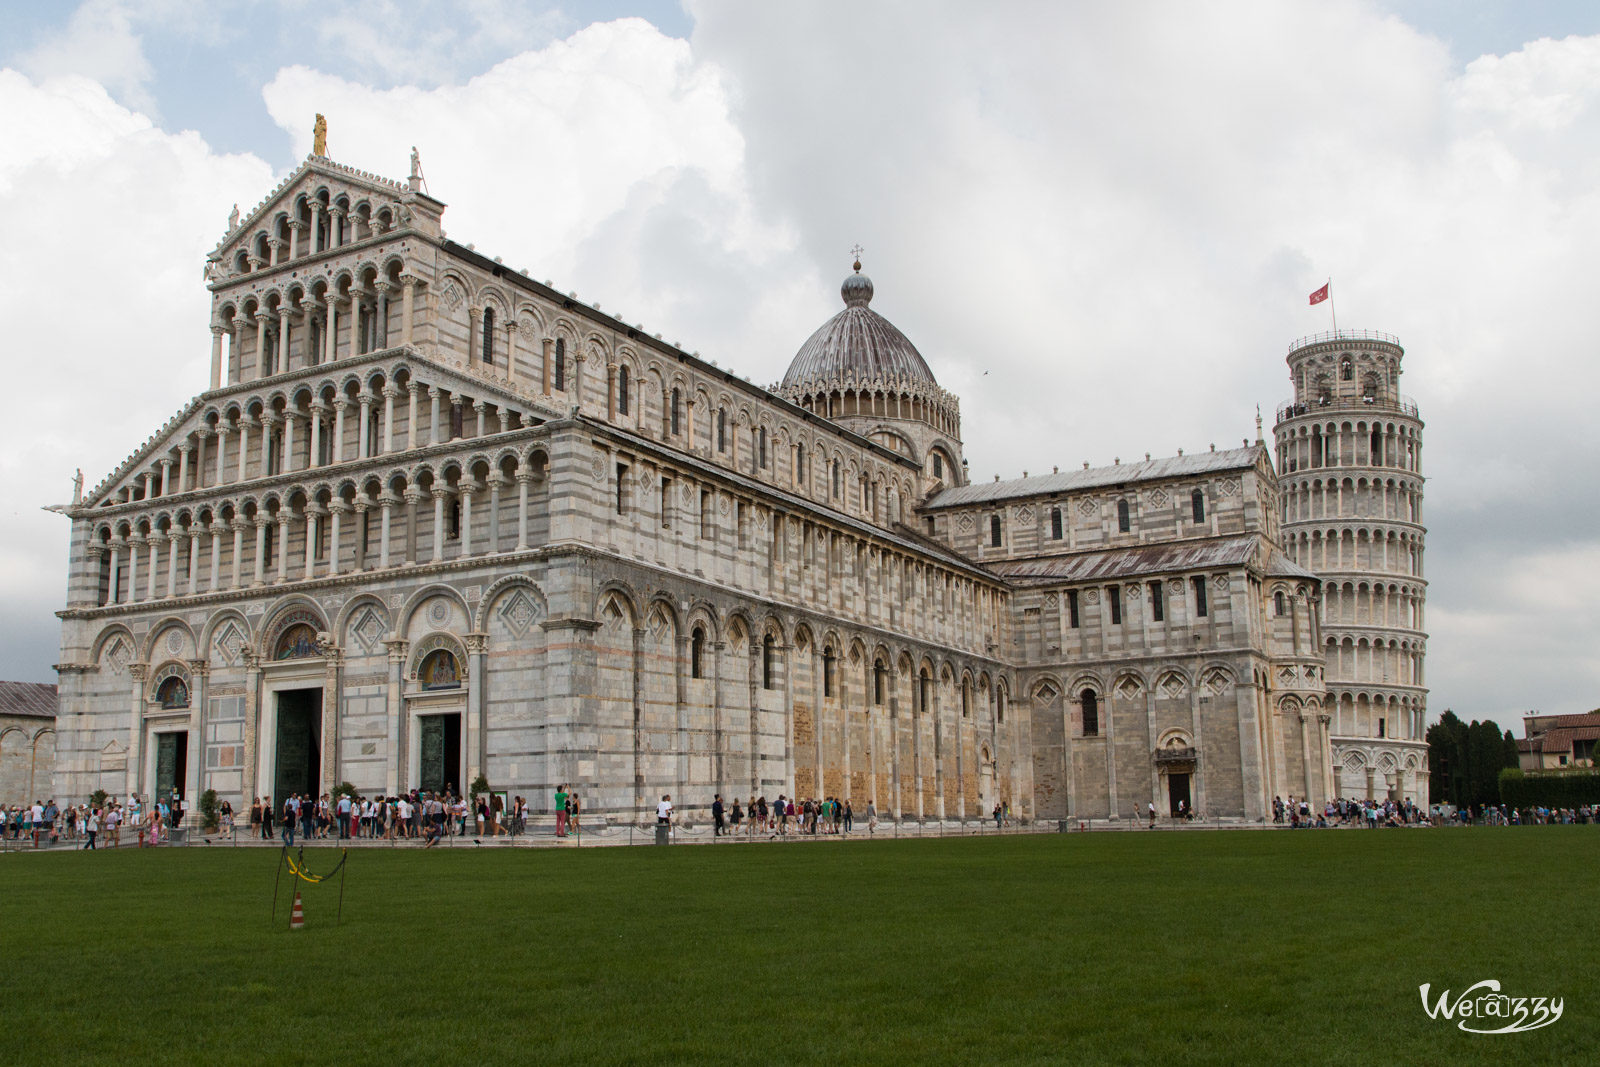 Italie, Pise, Toscane, Voyage